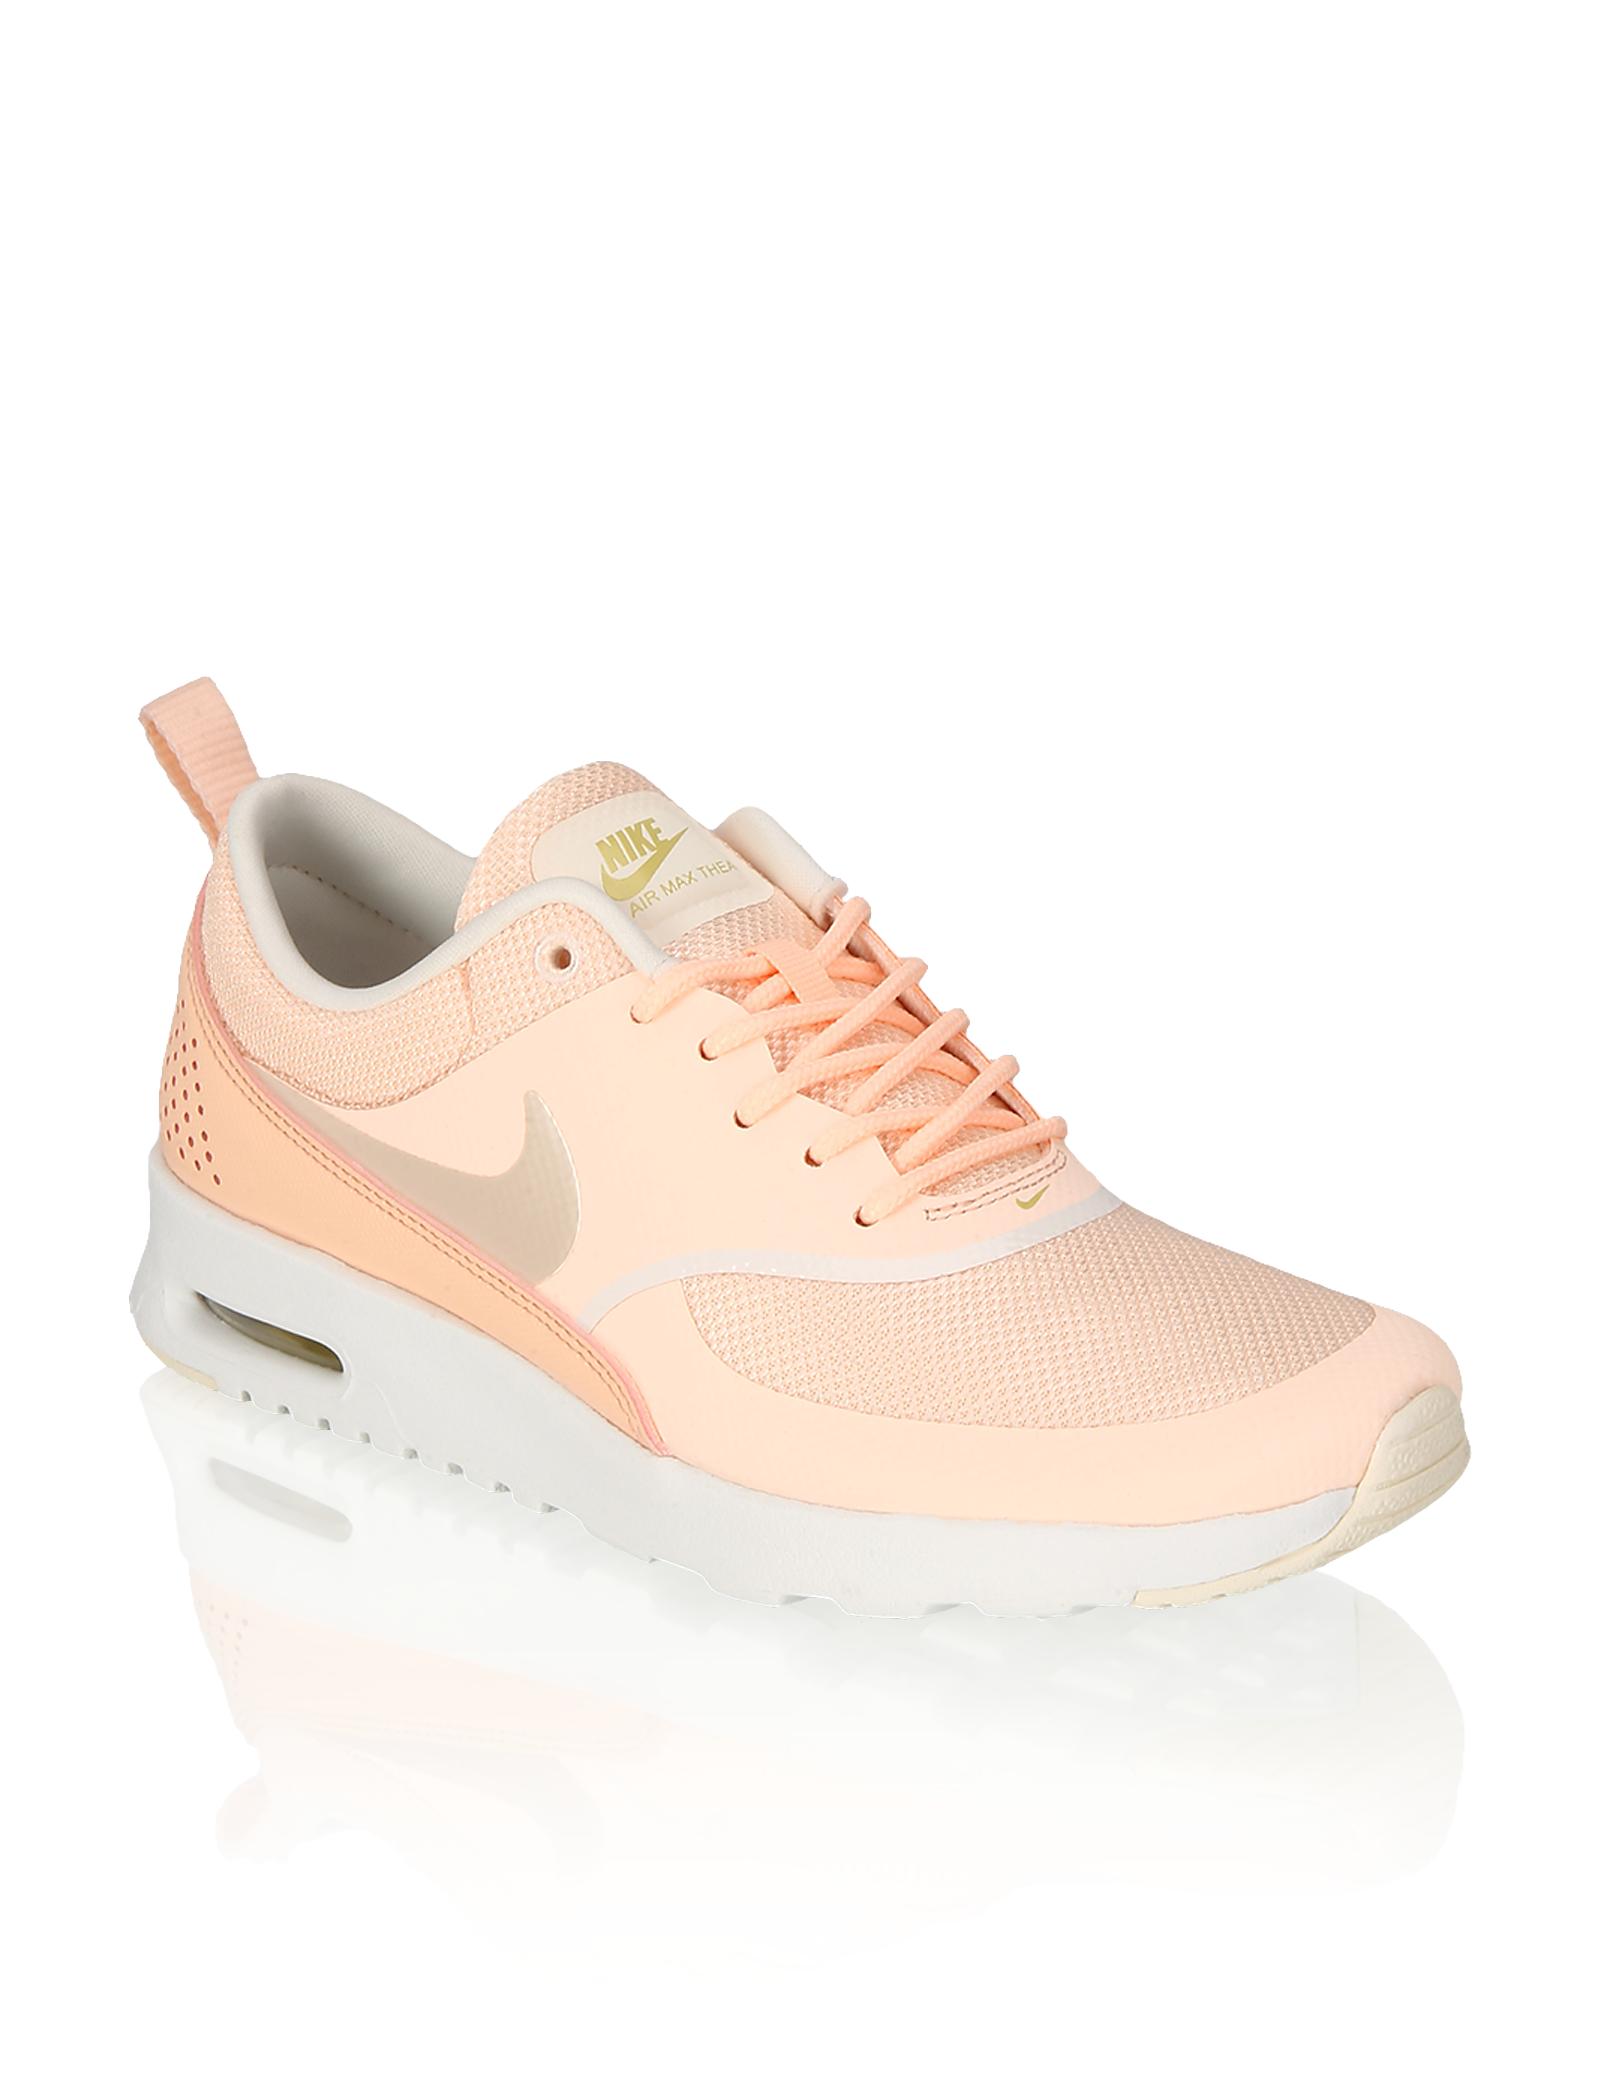 Rabatt Nike AIR MAX THEA Damen